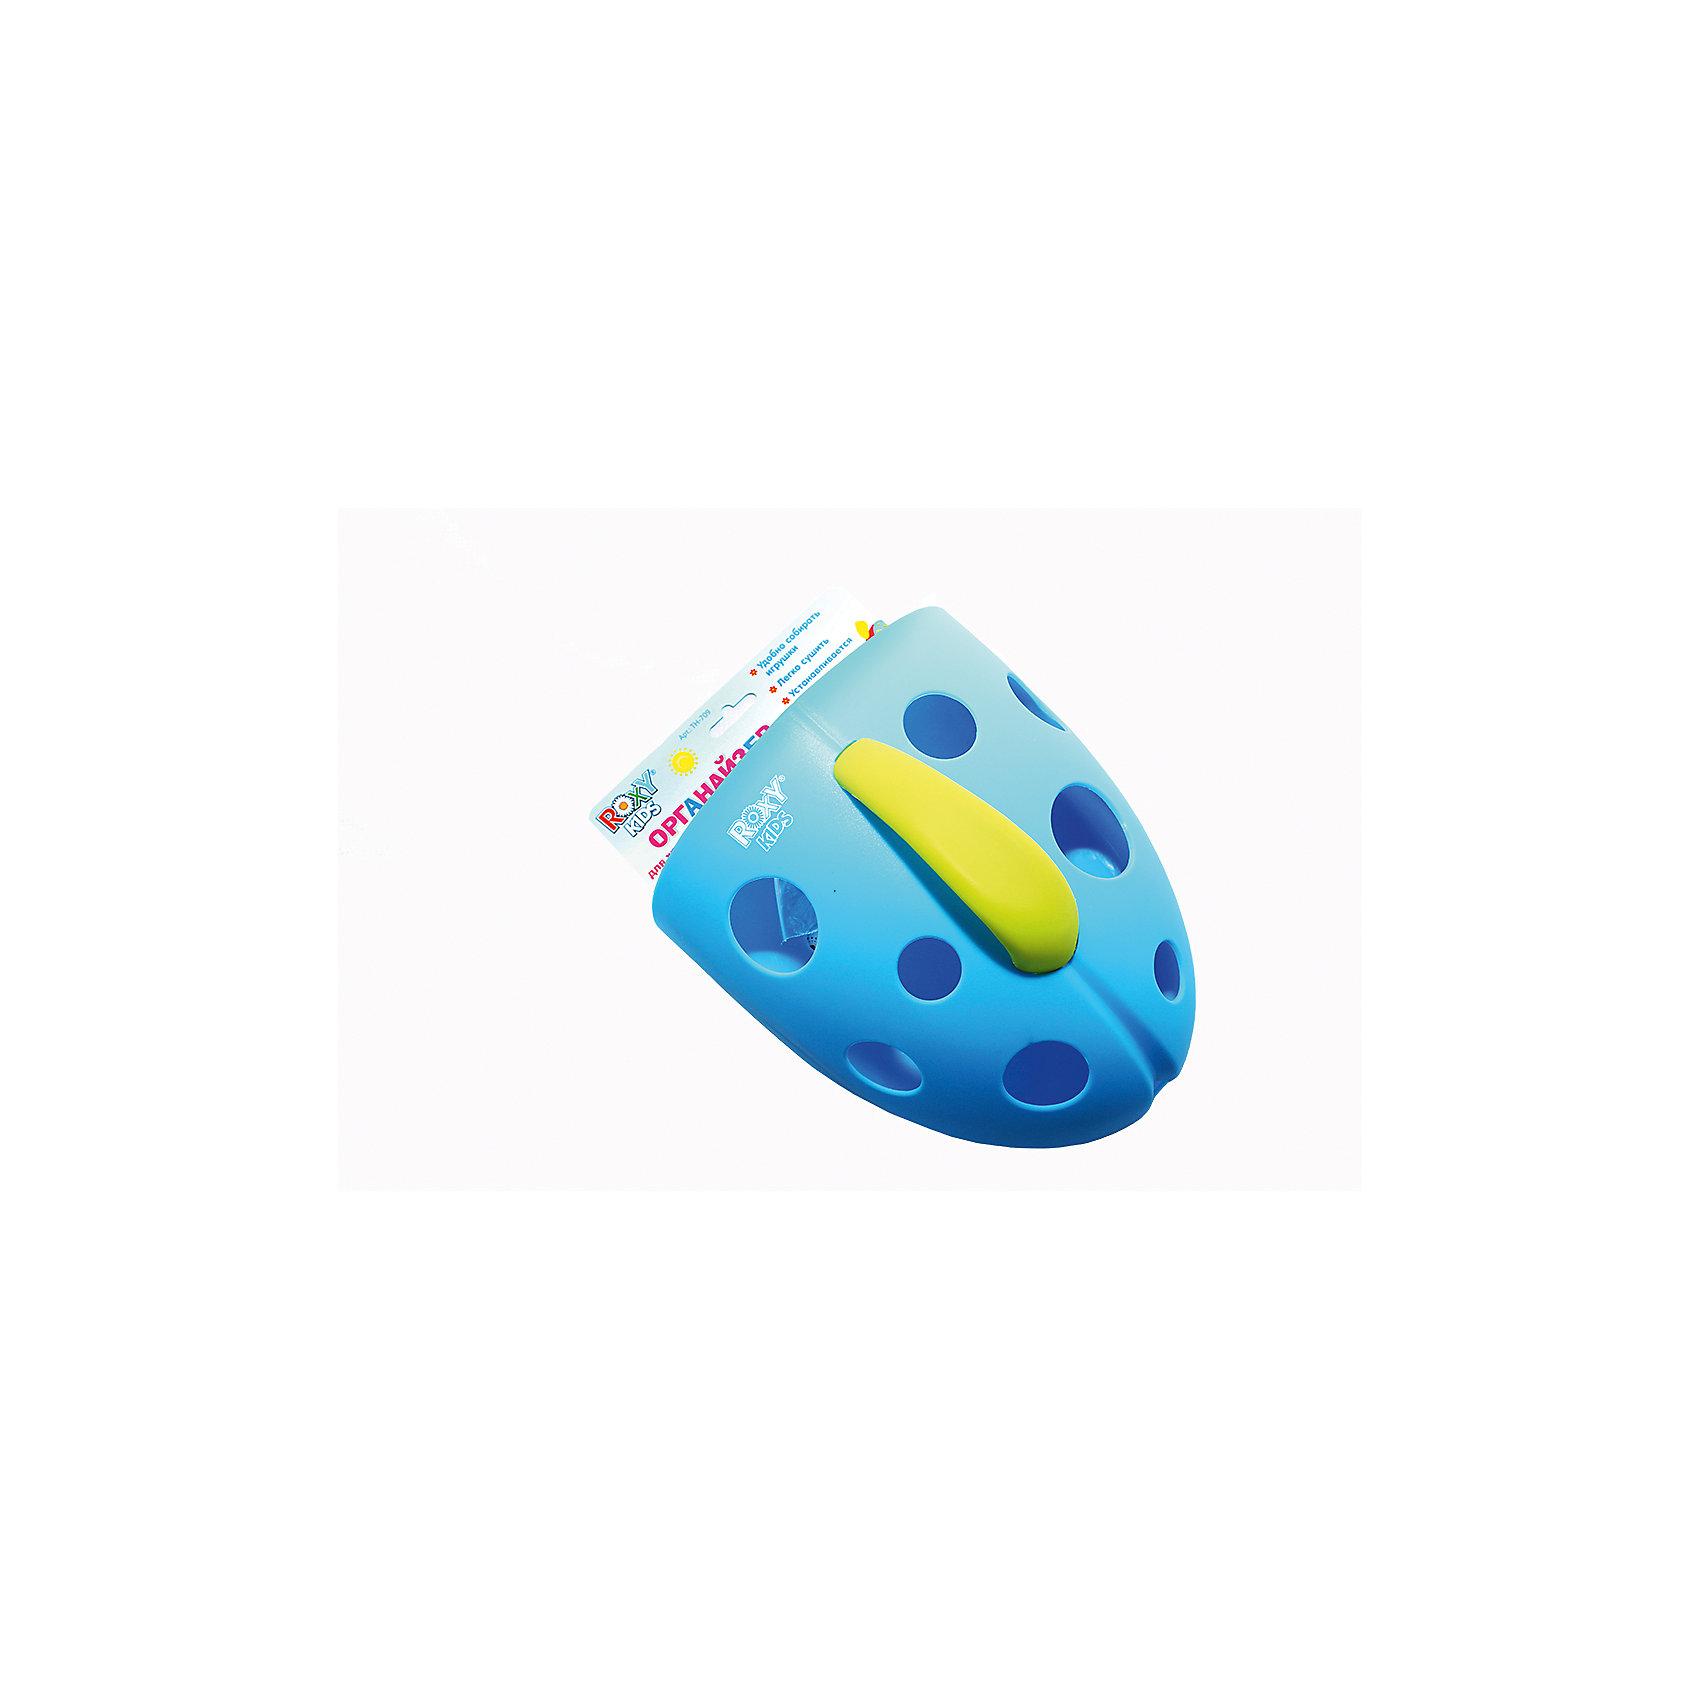 Roxy-Kids Органайзер для игрушек на присоске, Roxy-Kids, круг на шею для купания roxy kids flipper цвет голубой